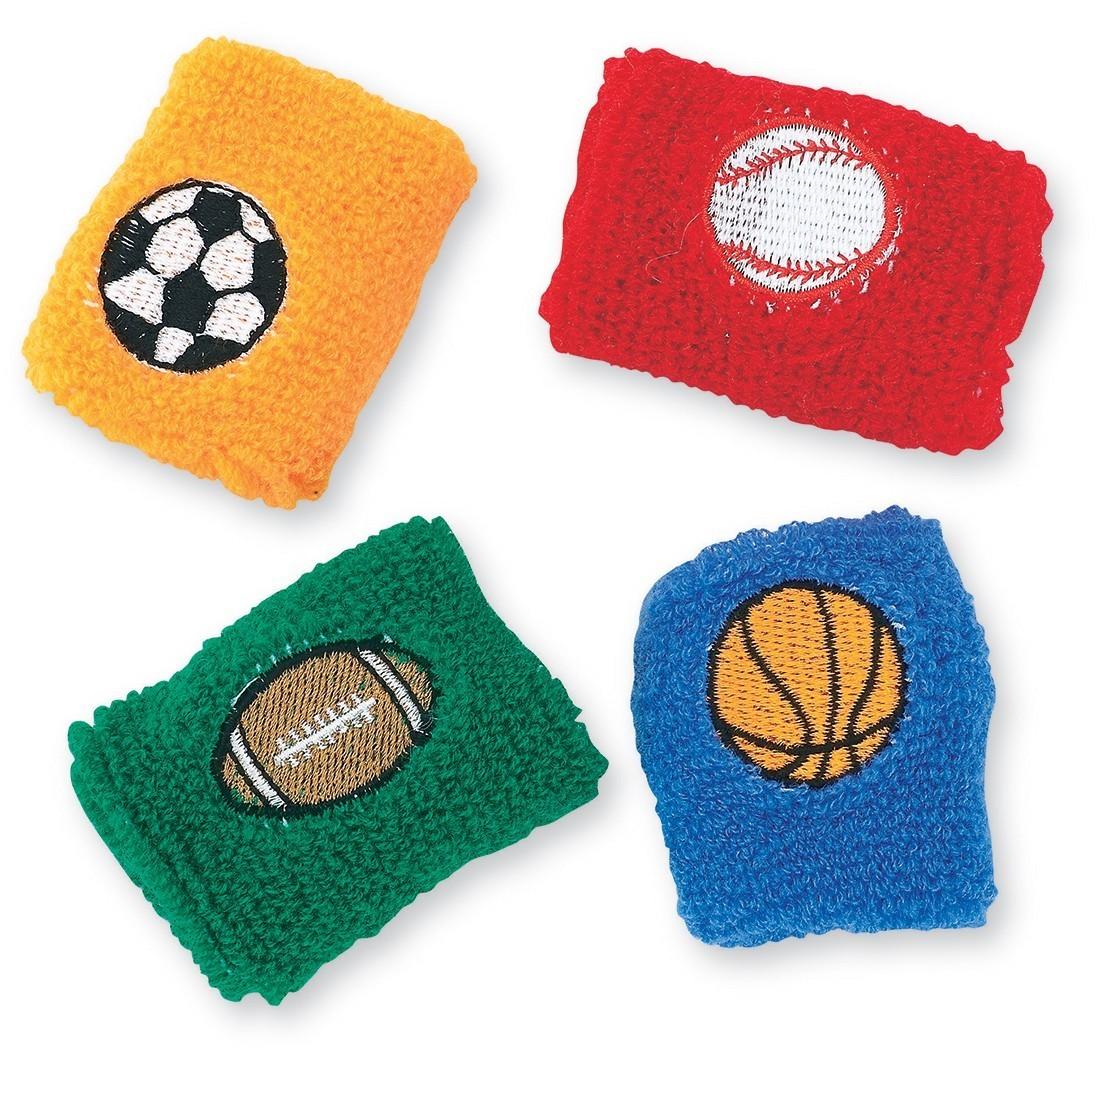 Sports Wristbands [image]